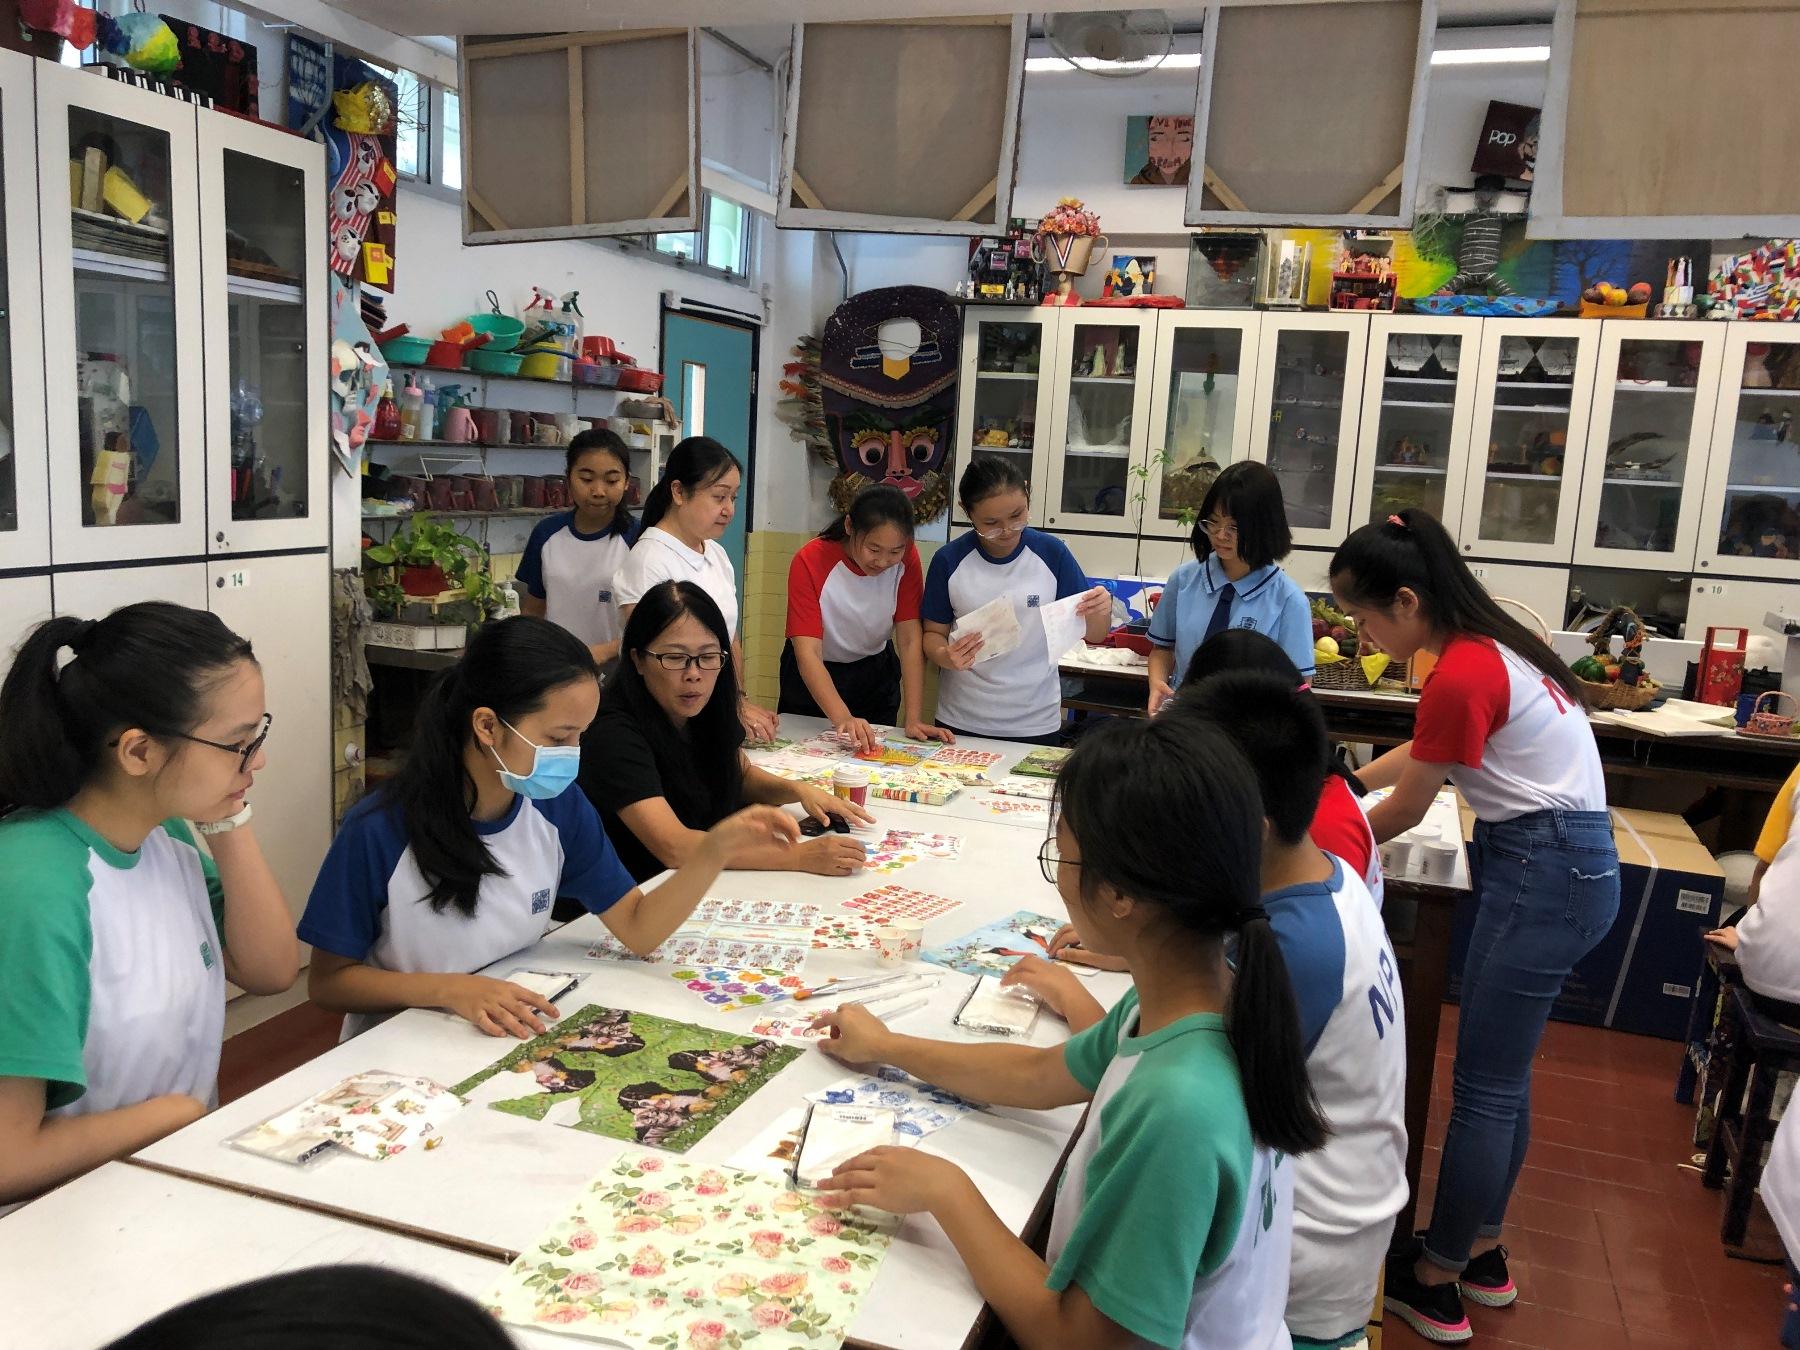 http://npc.edu.hk/sites/default/files/img_6960_1.jpg